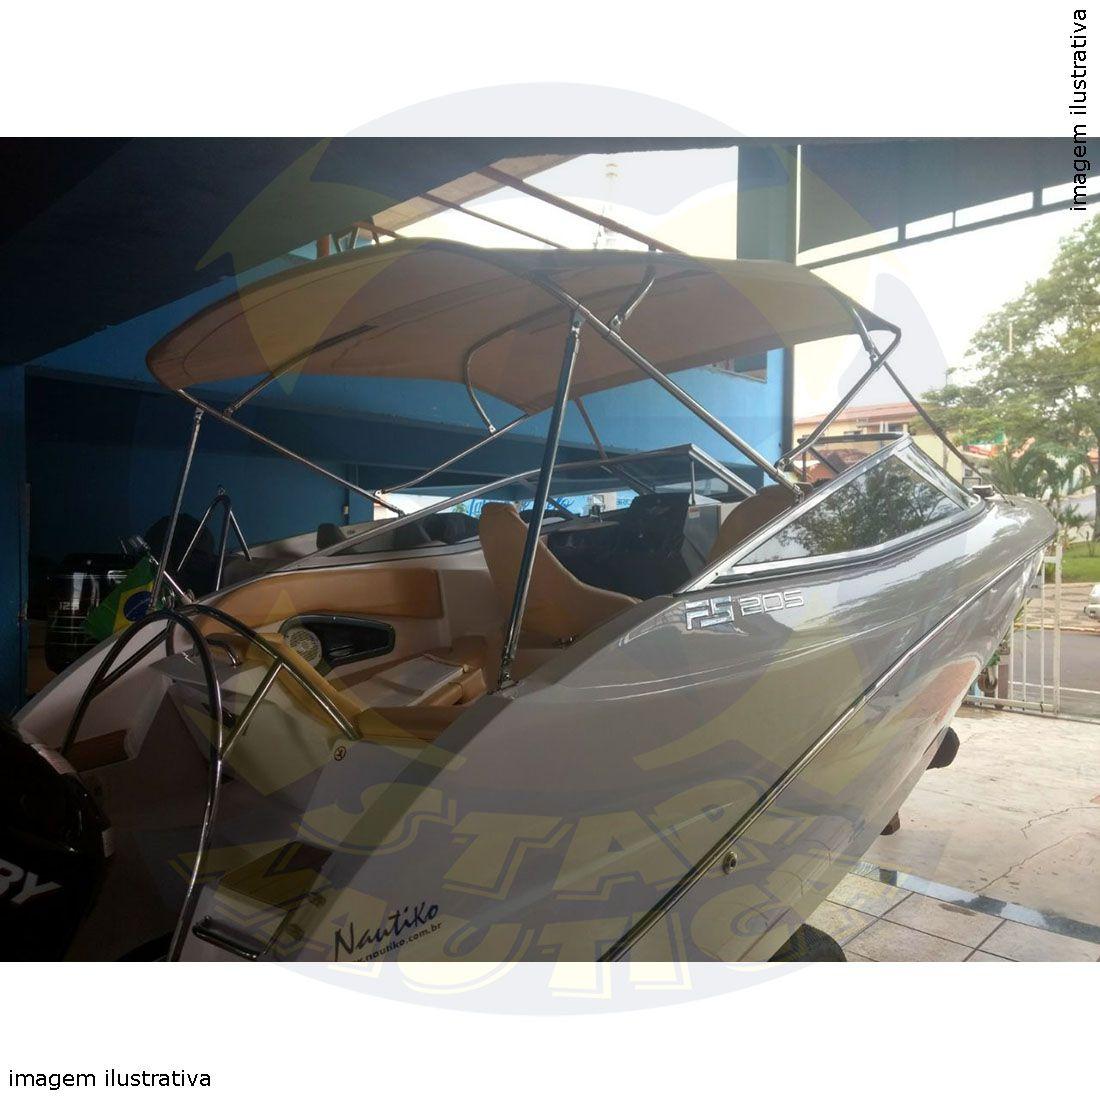 Capota Toldo Lancha Focker 215 Poliéster 4 Arcos Tubo 7/8